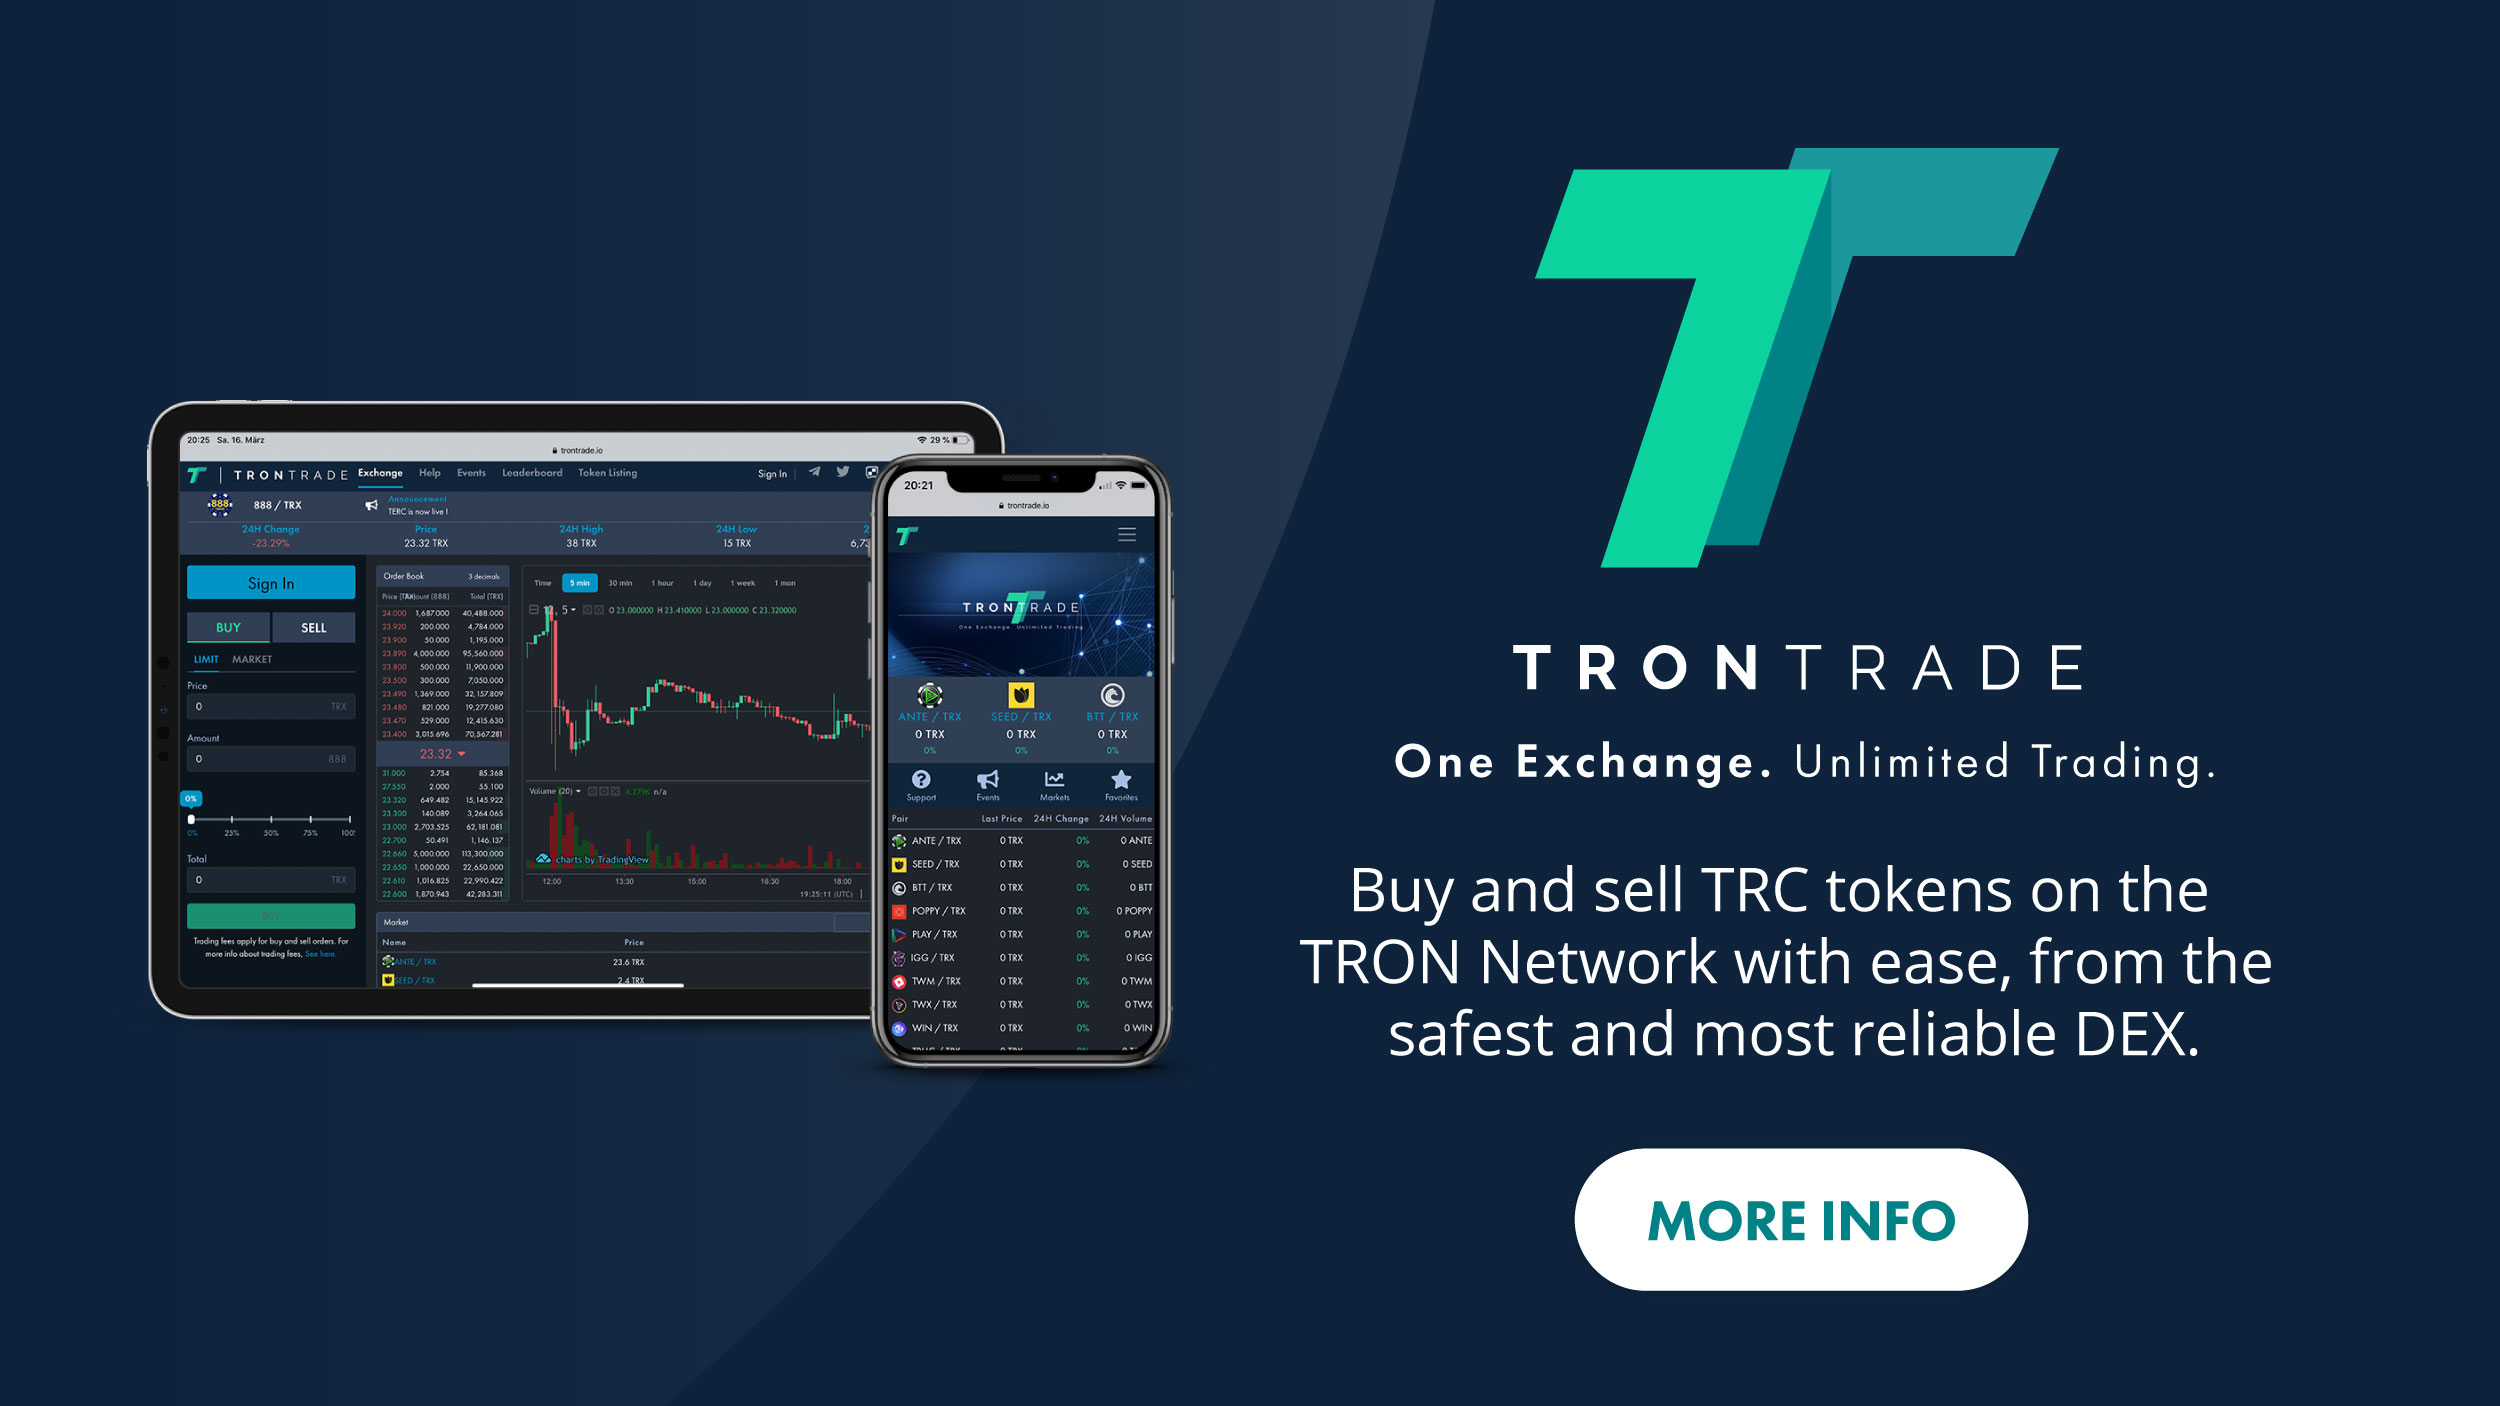 TronTrade_Carousel.jpg